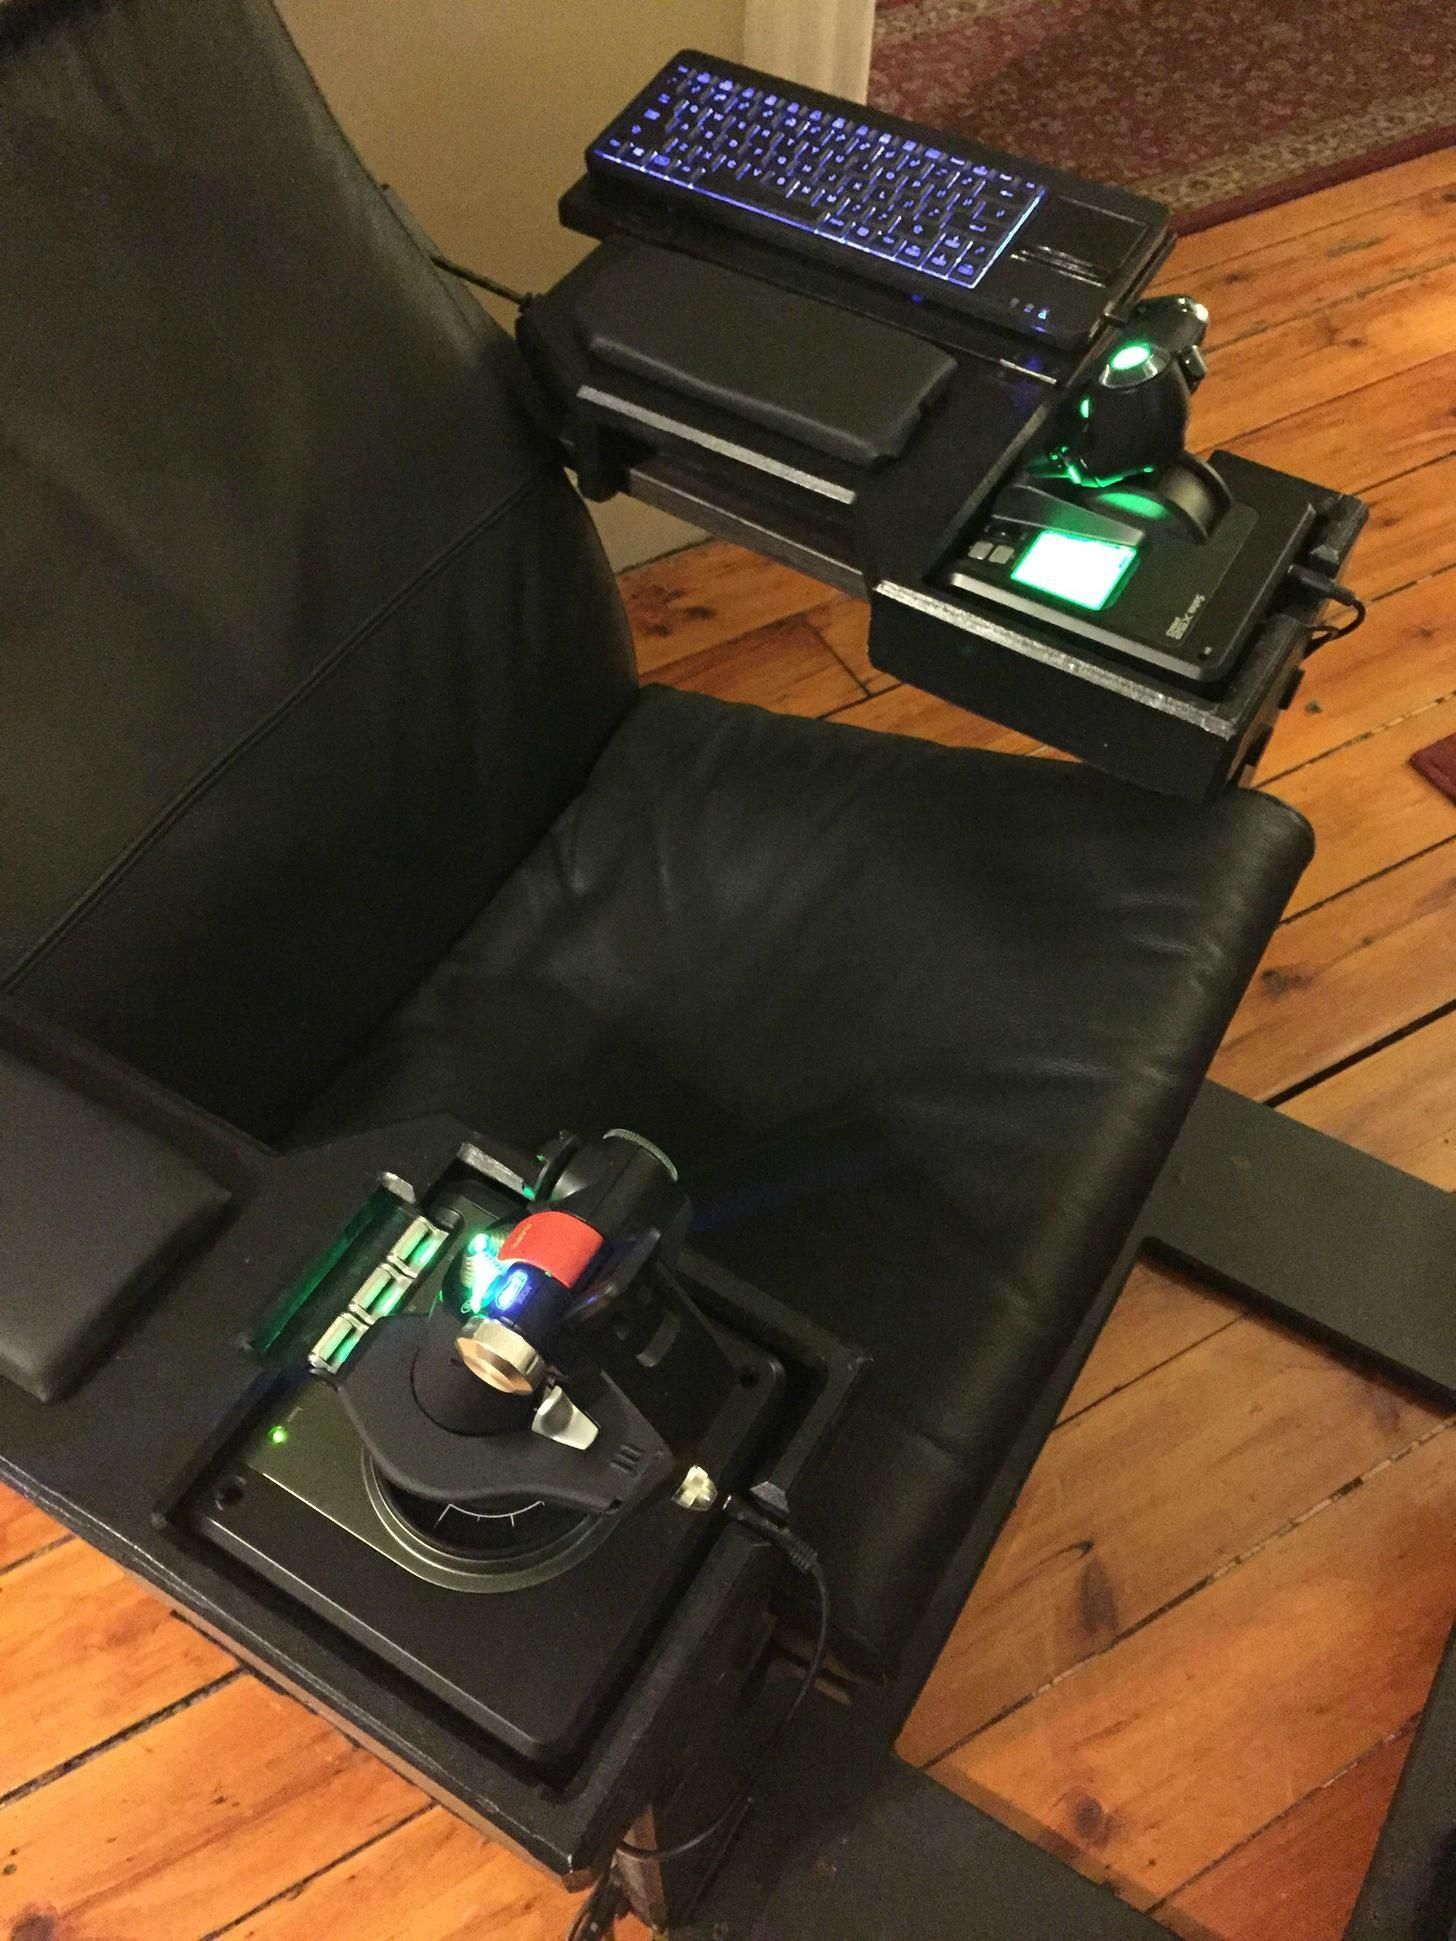 Elite Dangerous Ikea Poang Chair Simpit Add On Ikea Poang Chair Cockpit Flight Simulator Cockpit